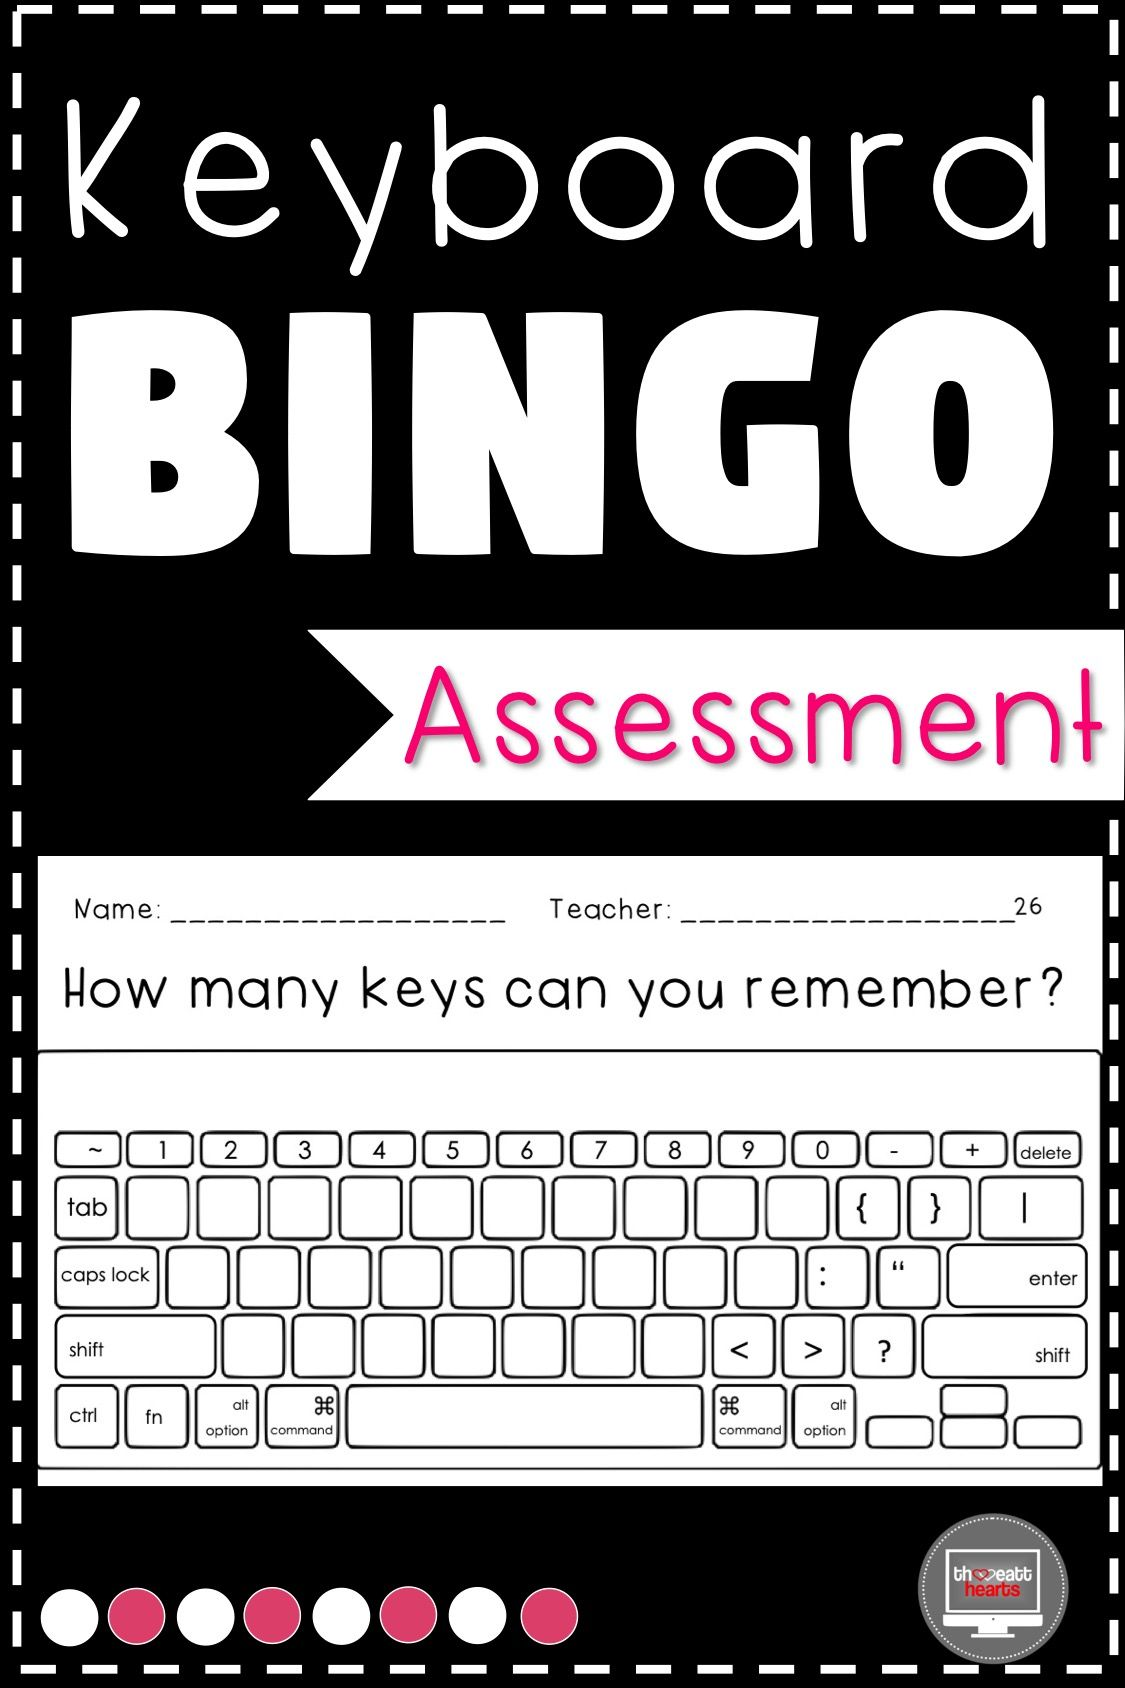 Keyboard Bingo Game Keyboard, Bingo games, Bingo